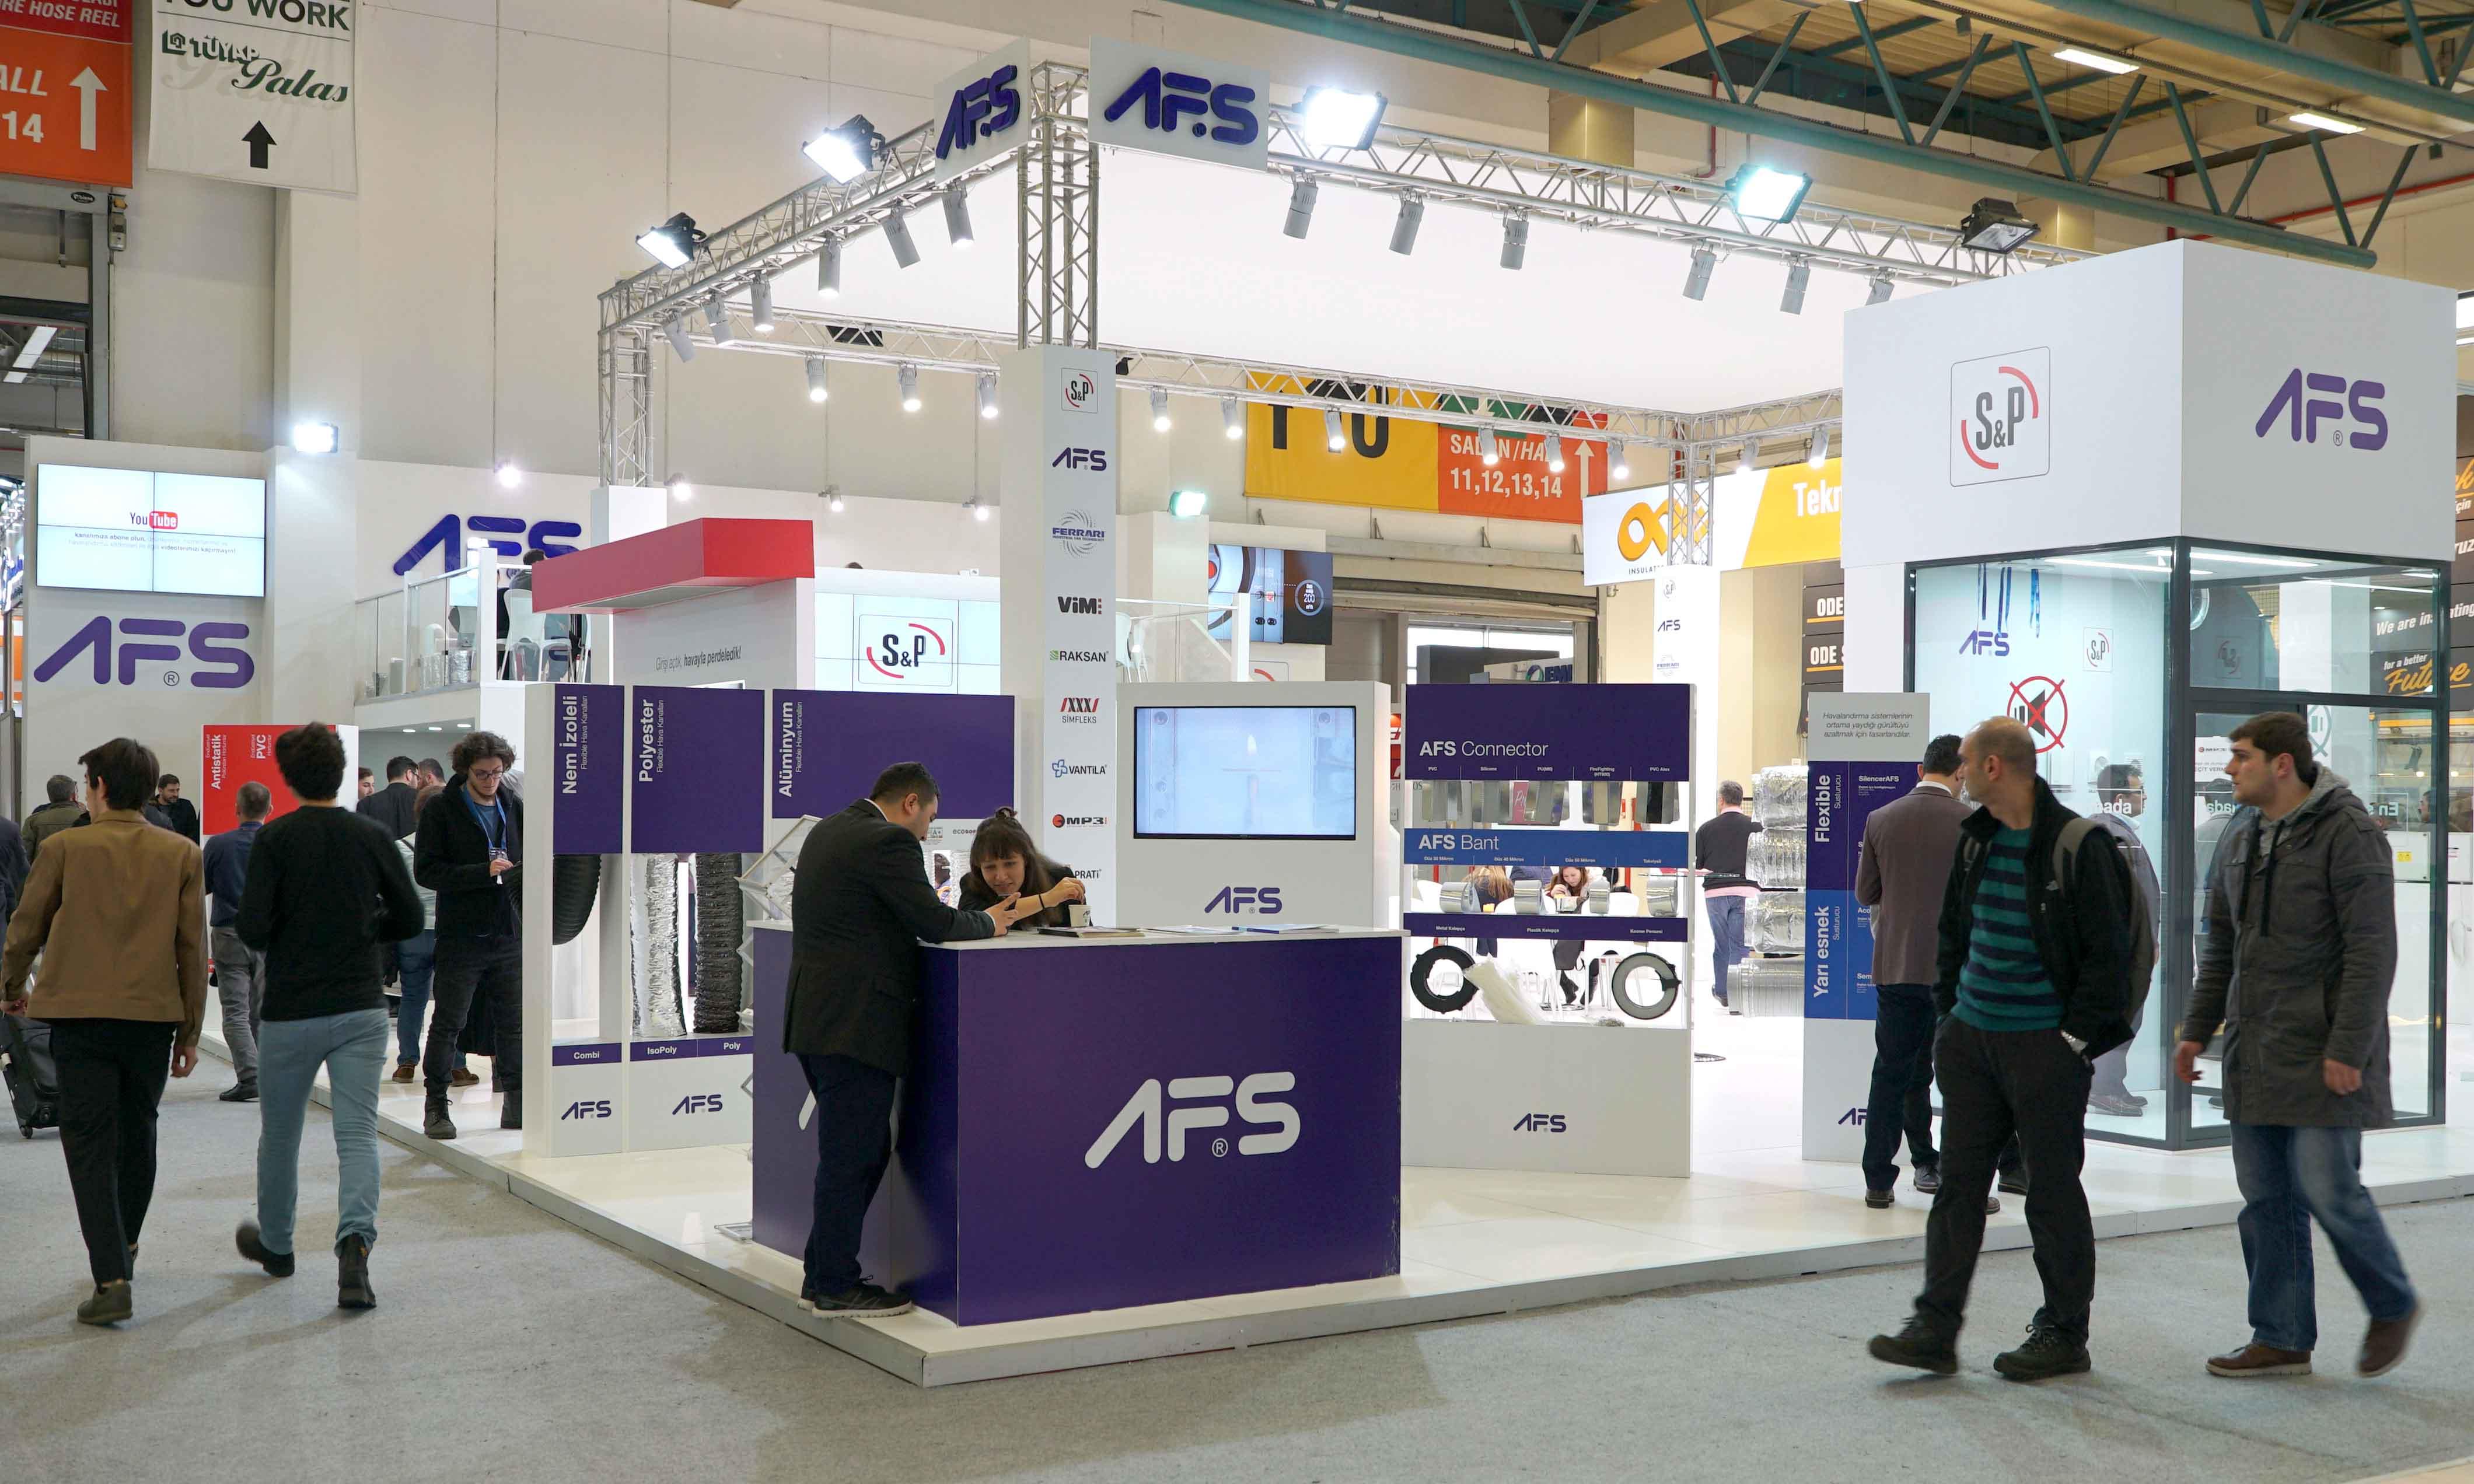 S&P AFS ISK-Sodex 2018 İstanbul Fuarında